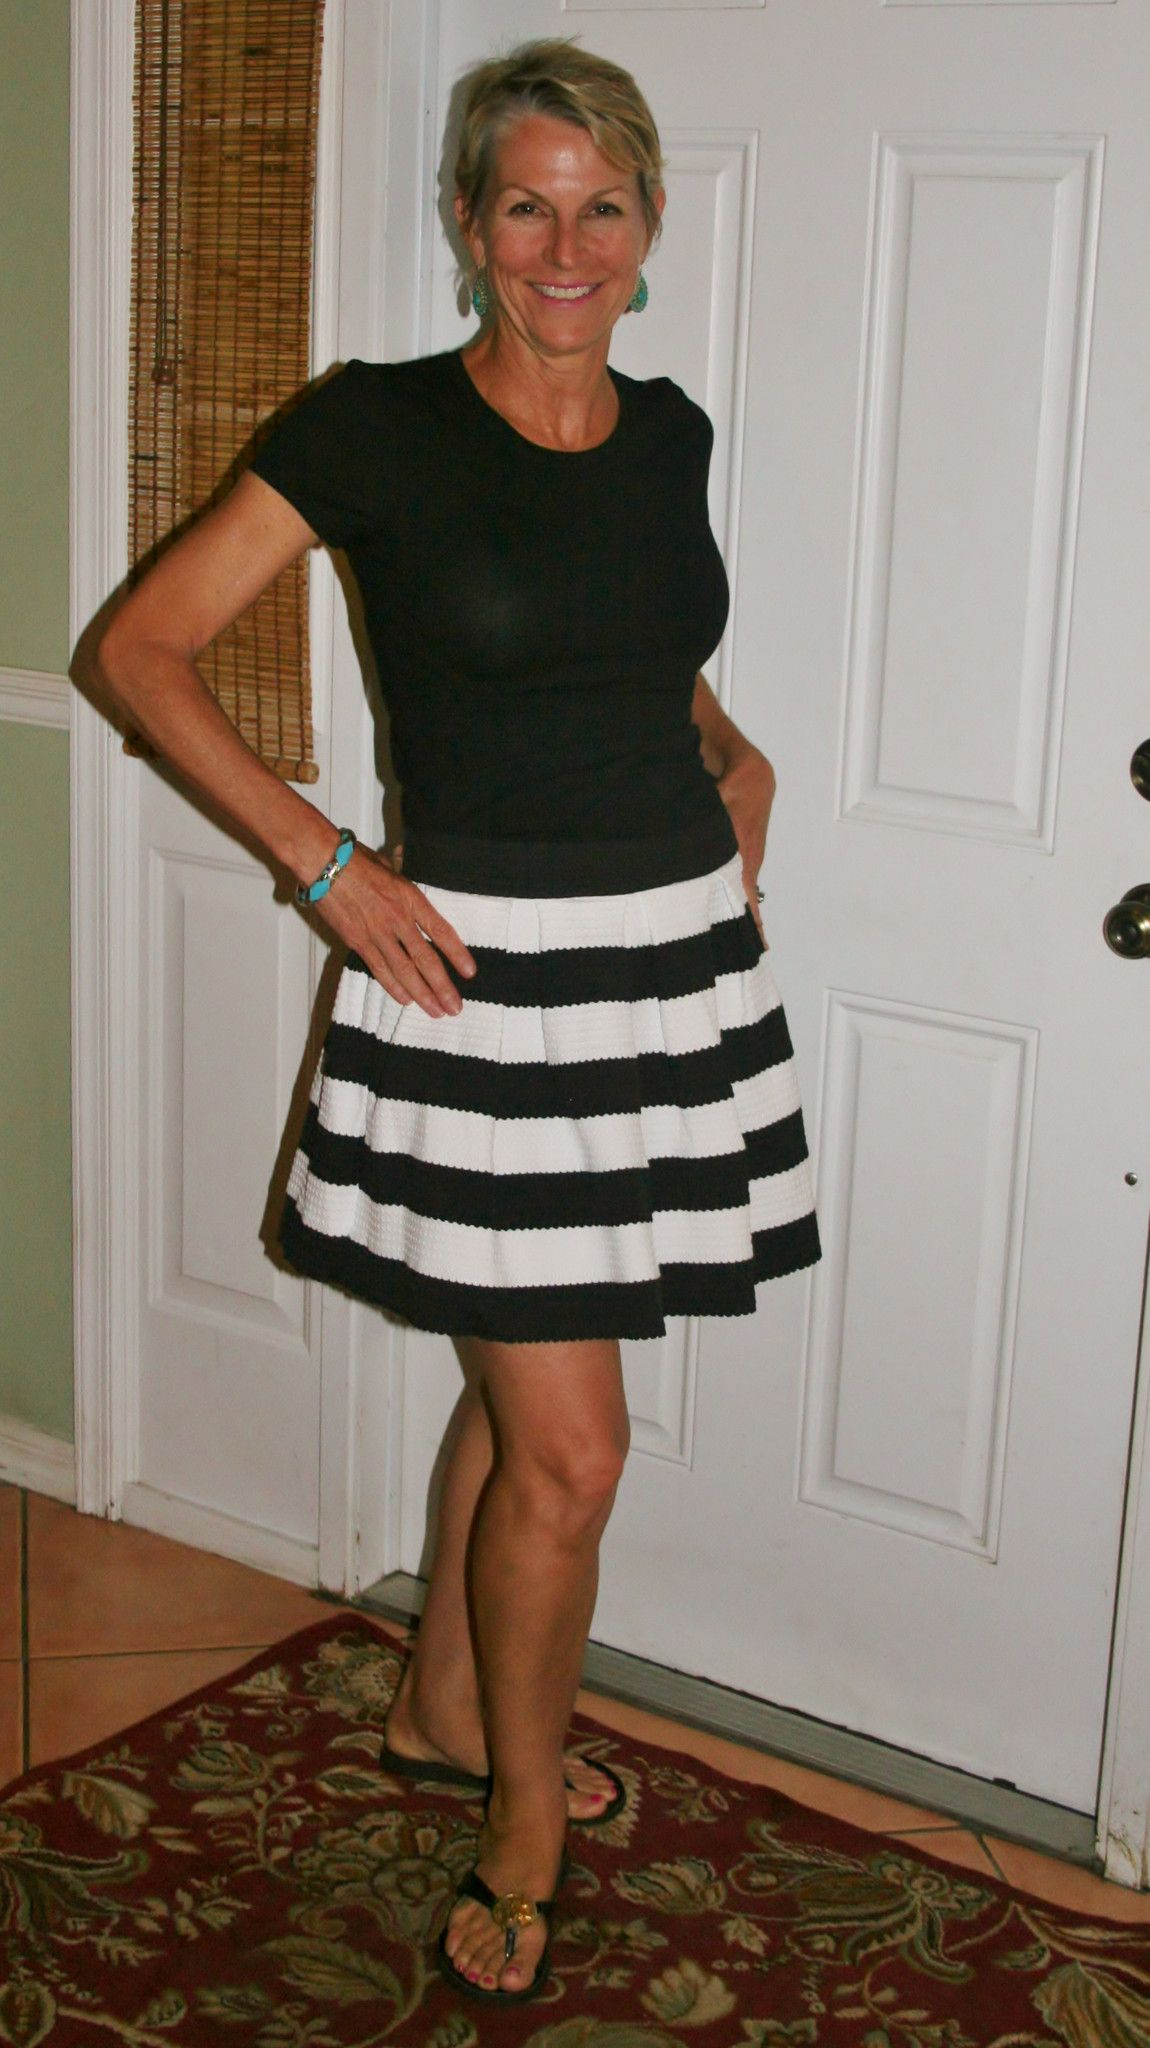 c313b9ef8 Black & White Wide Striped Short Skirt | skirts | Striped shorts ...